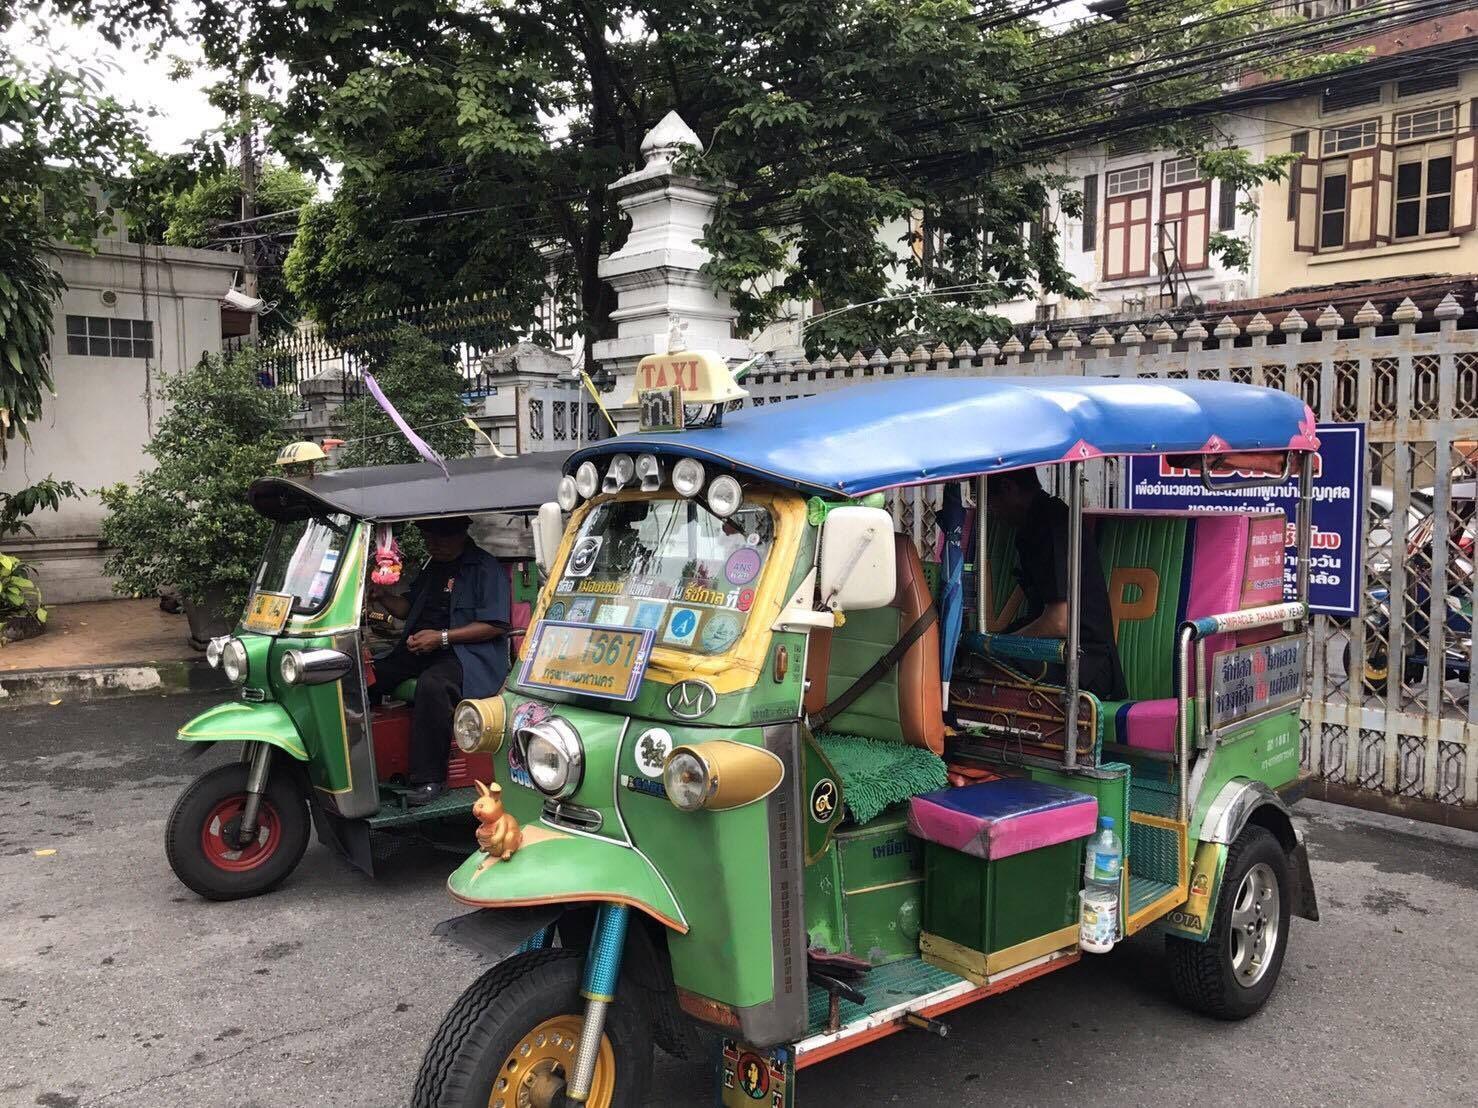 abenteuer bangkok asienreisen von asian dreams gmbh. Black Bedroom Furniture Sets. Home Design Ideas